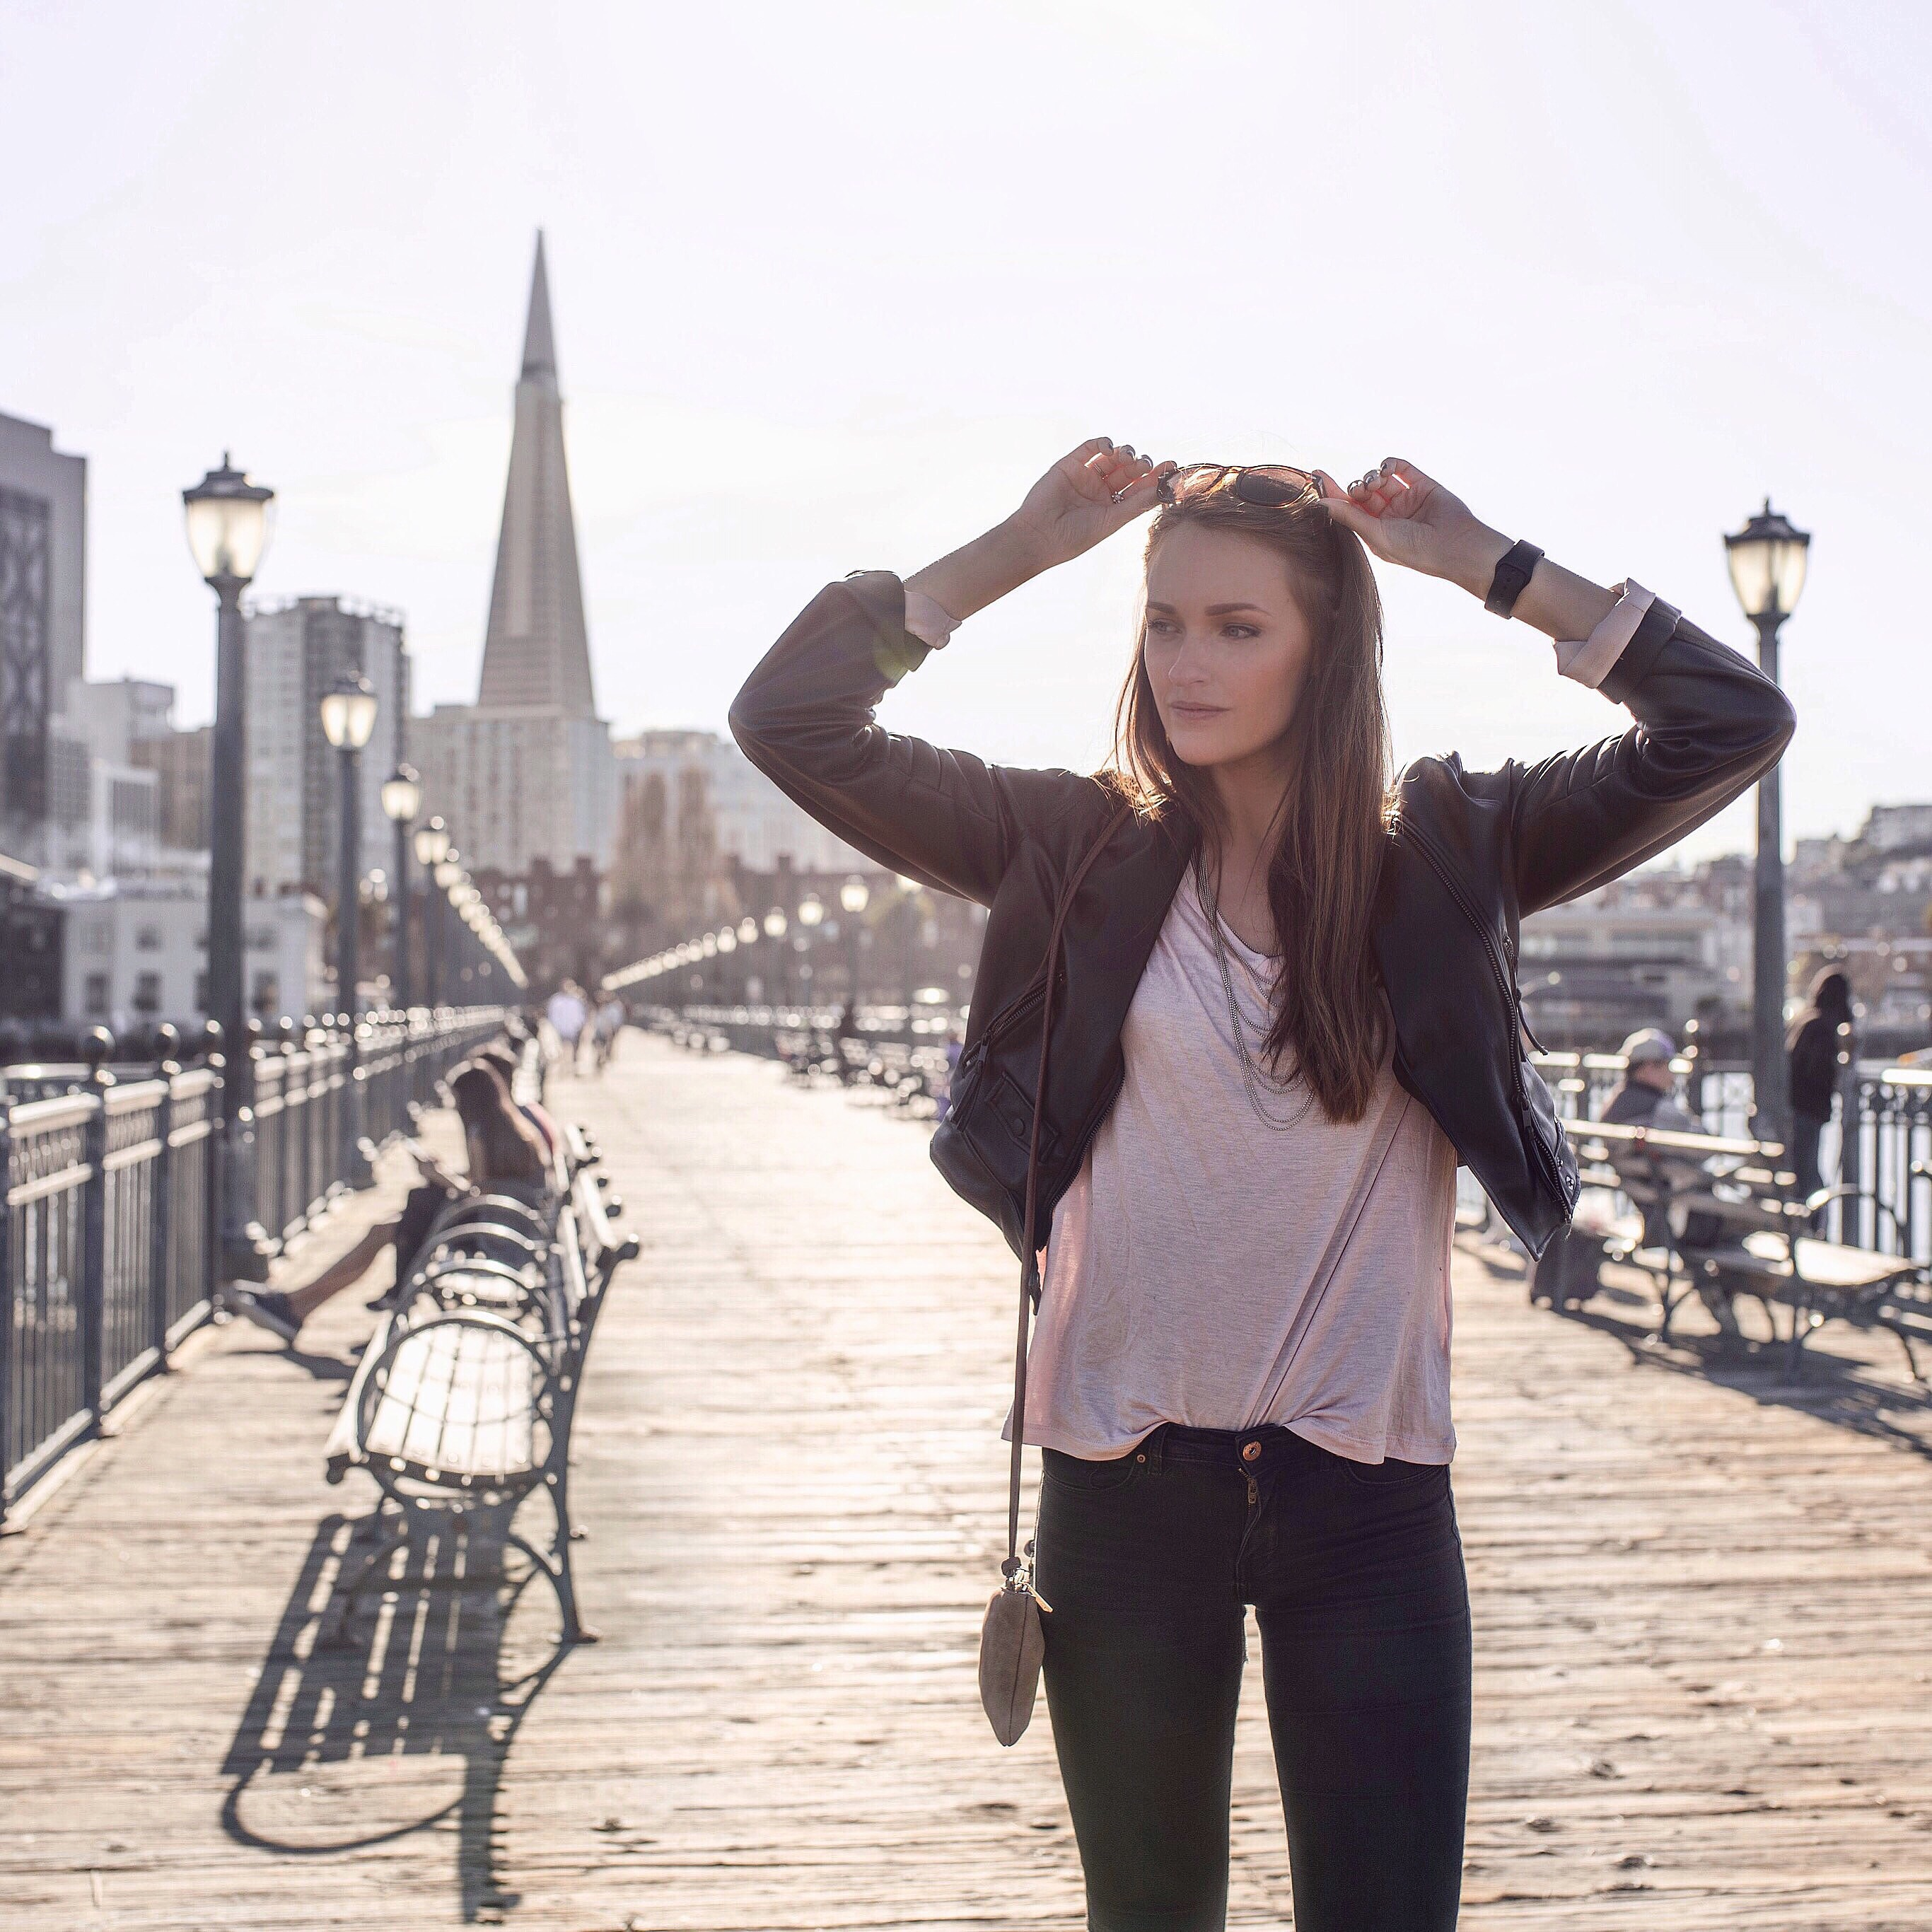 Alexandra Andersson ståendes på en bro med stad i bakgrunden